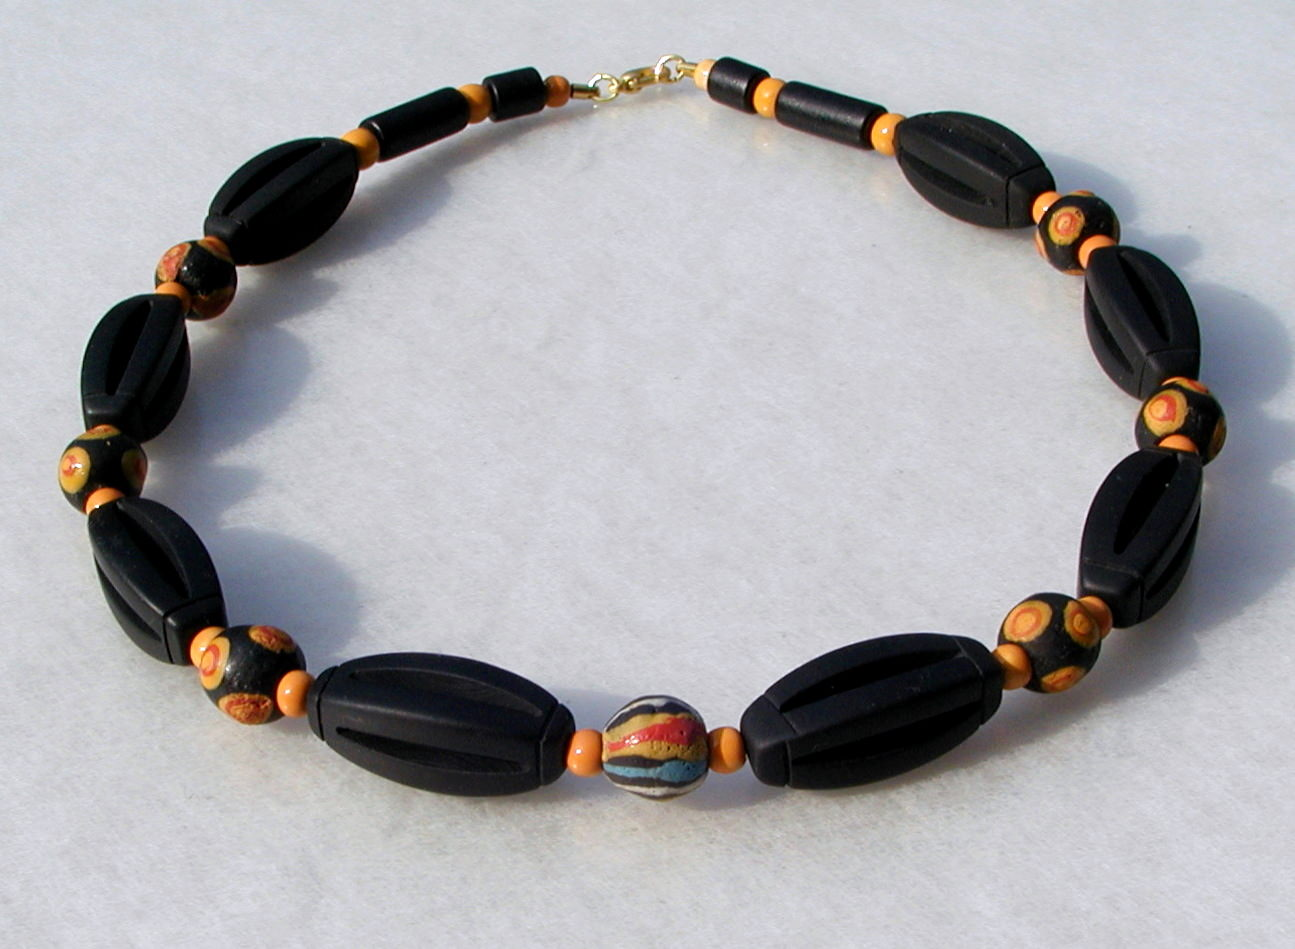 Kleinesbild - Halskette  AFRIKA SCHWARZ-ORANGE Onyx Krobo-Perlen Keramik